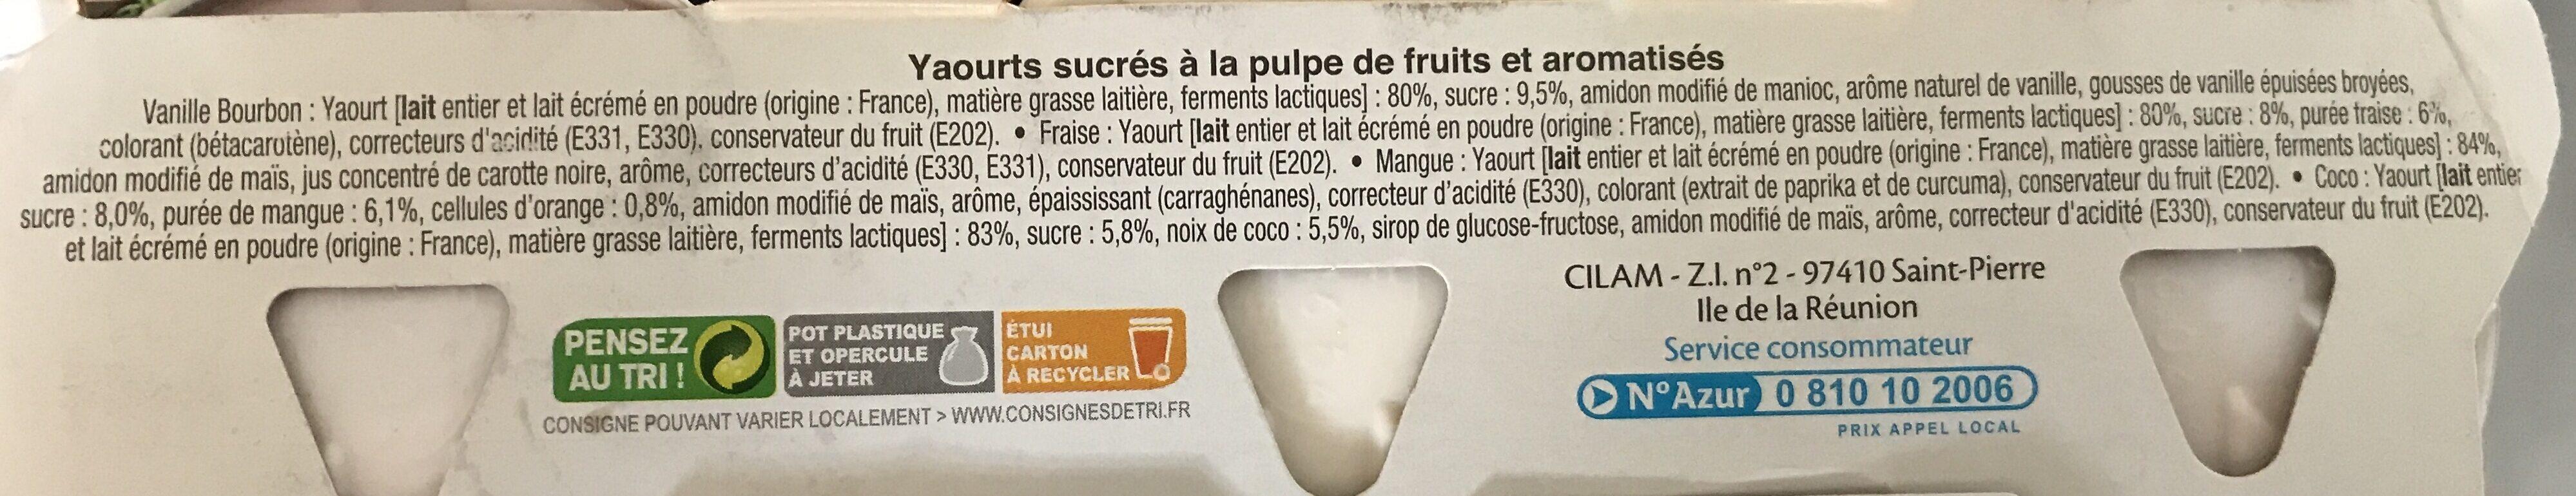 Fruits mixes - Ingrédients - fr